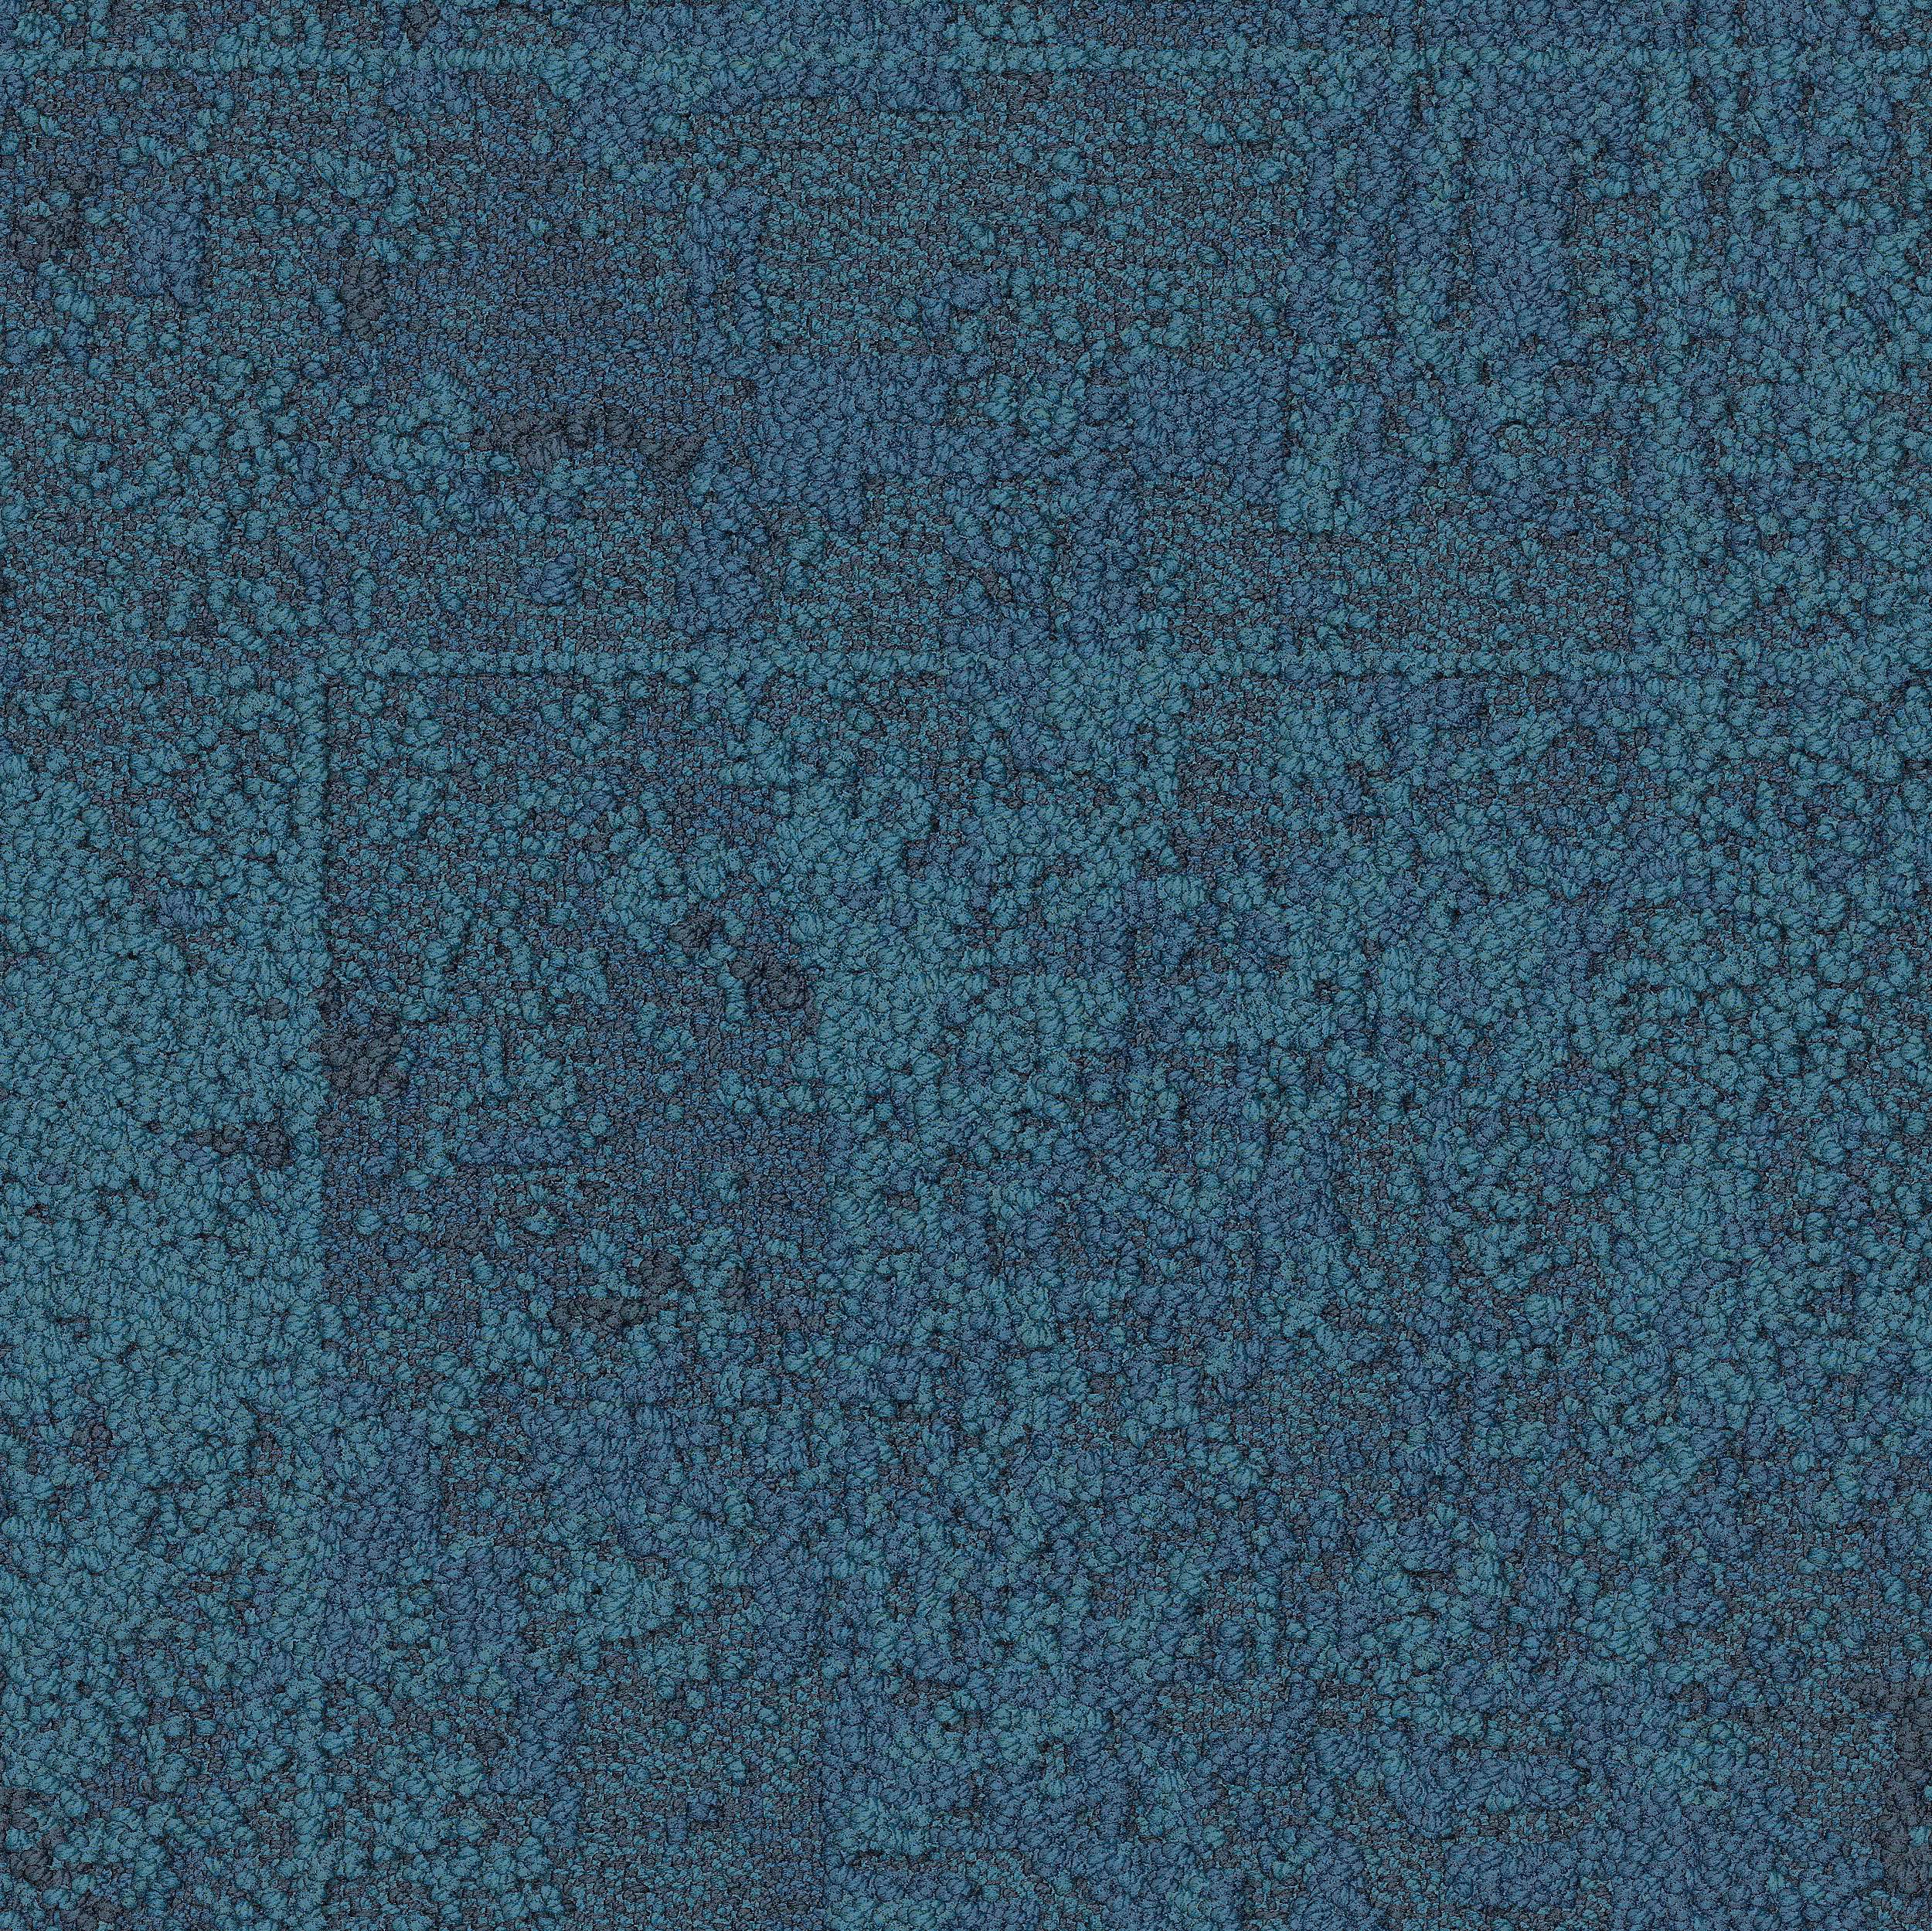 Net Effect One B601 Atlantic Carpet Tiles From Interface